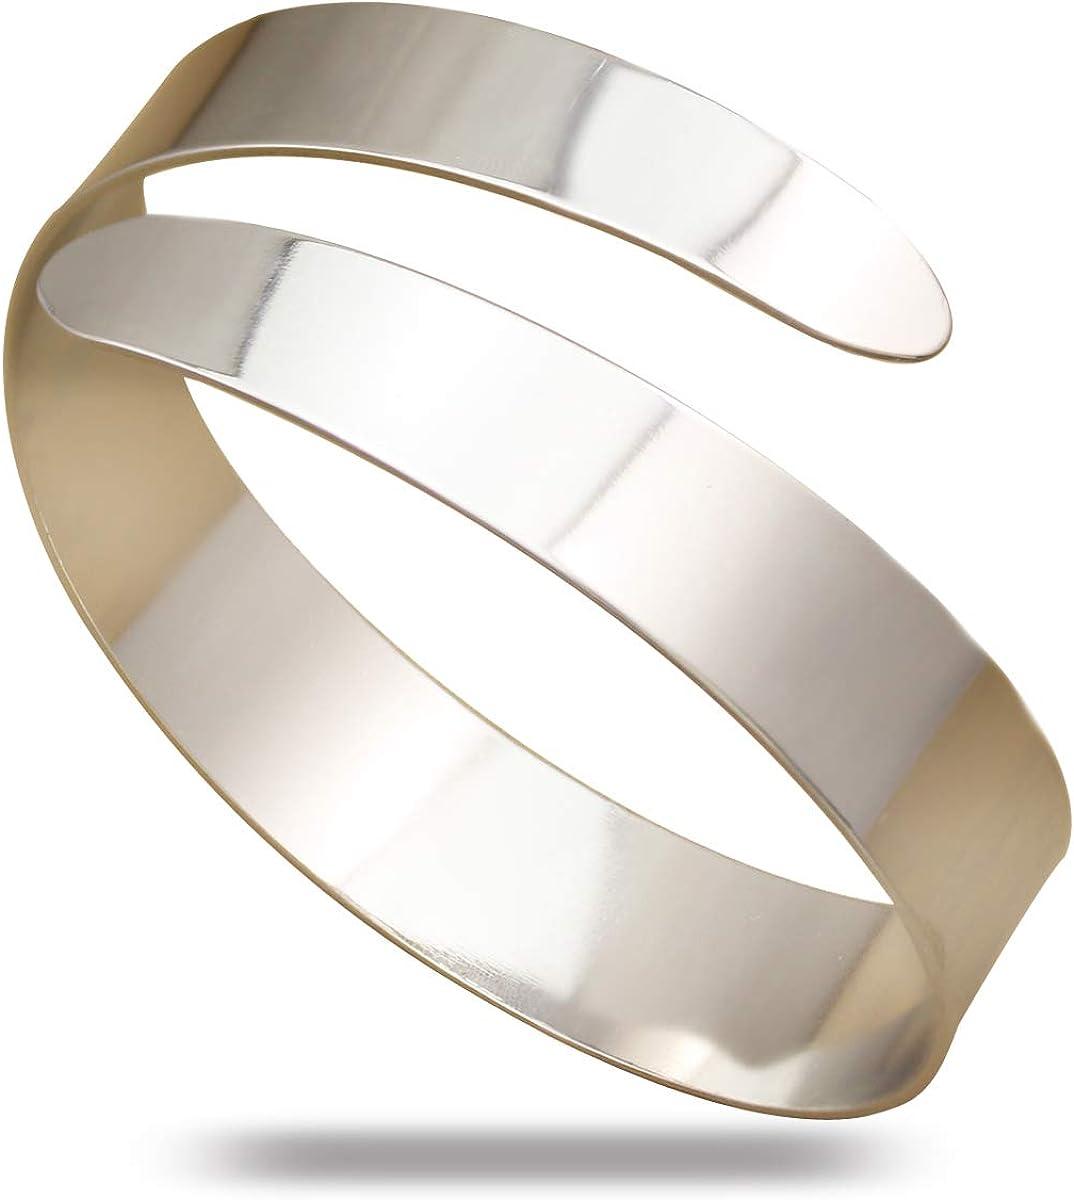 RechicGu Egypt Cleopatra Swirl Snake Upper Arm Cuff Armlet Armband Bangle Bracelet